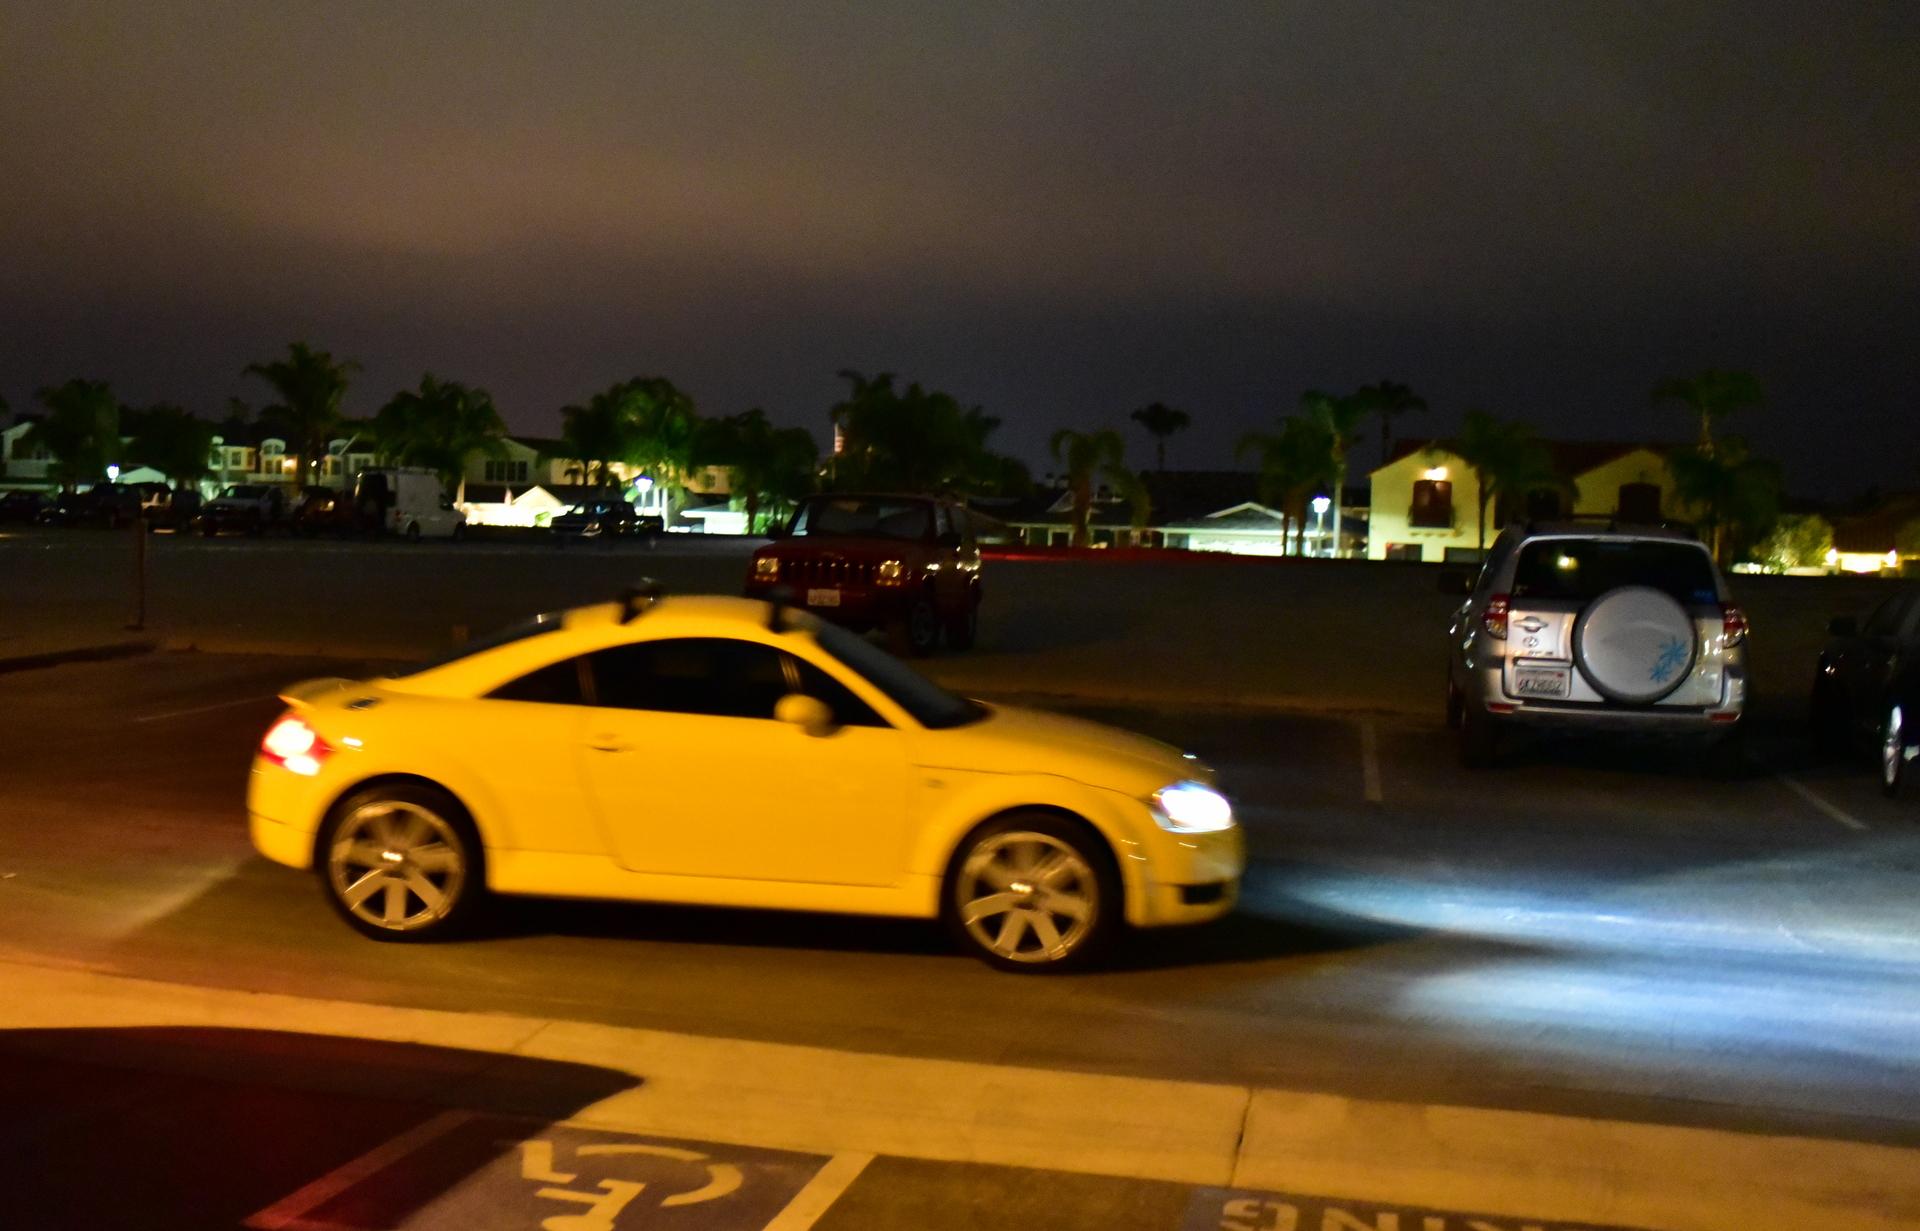 car driving through the Newport Aquatic Center parking lot at night